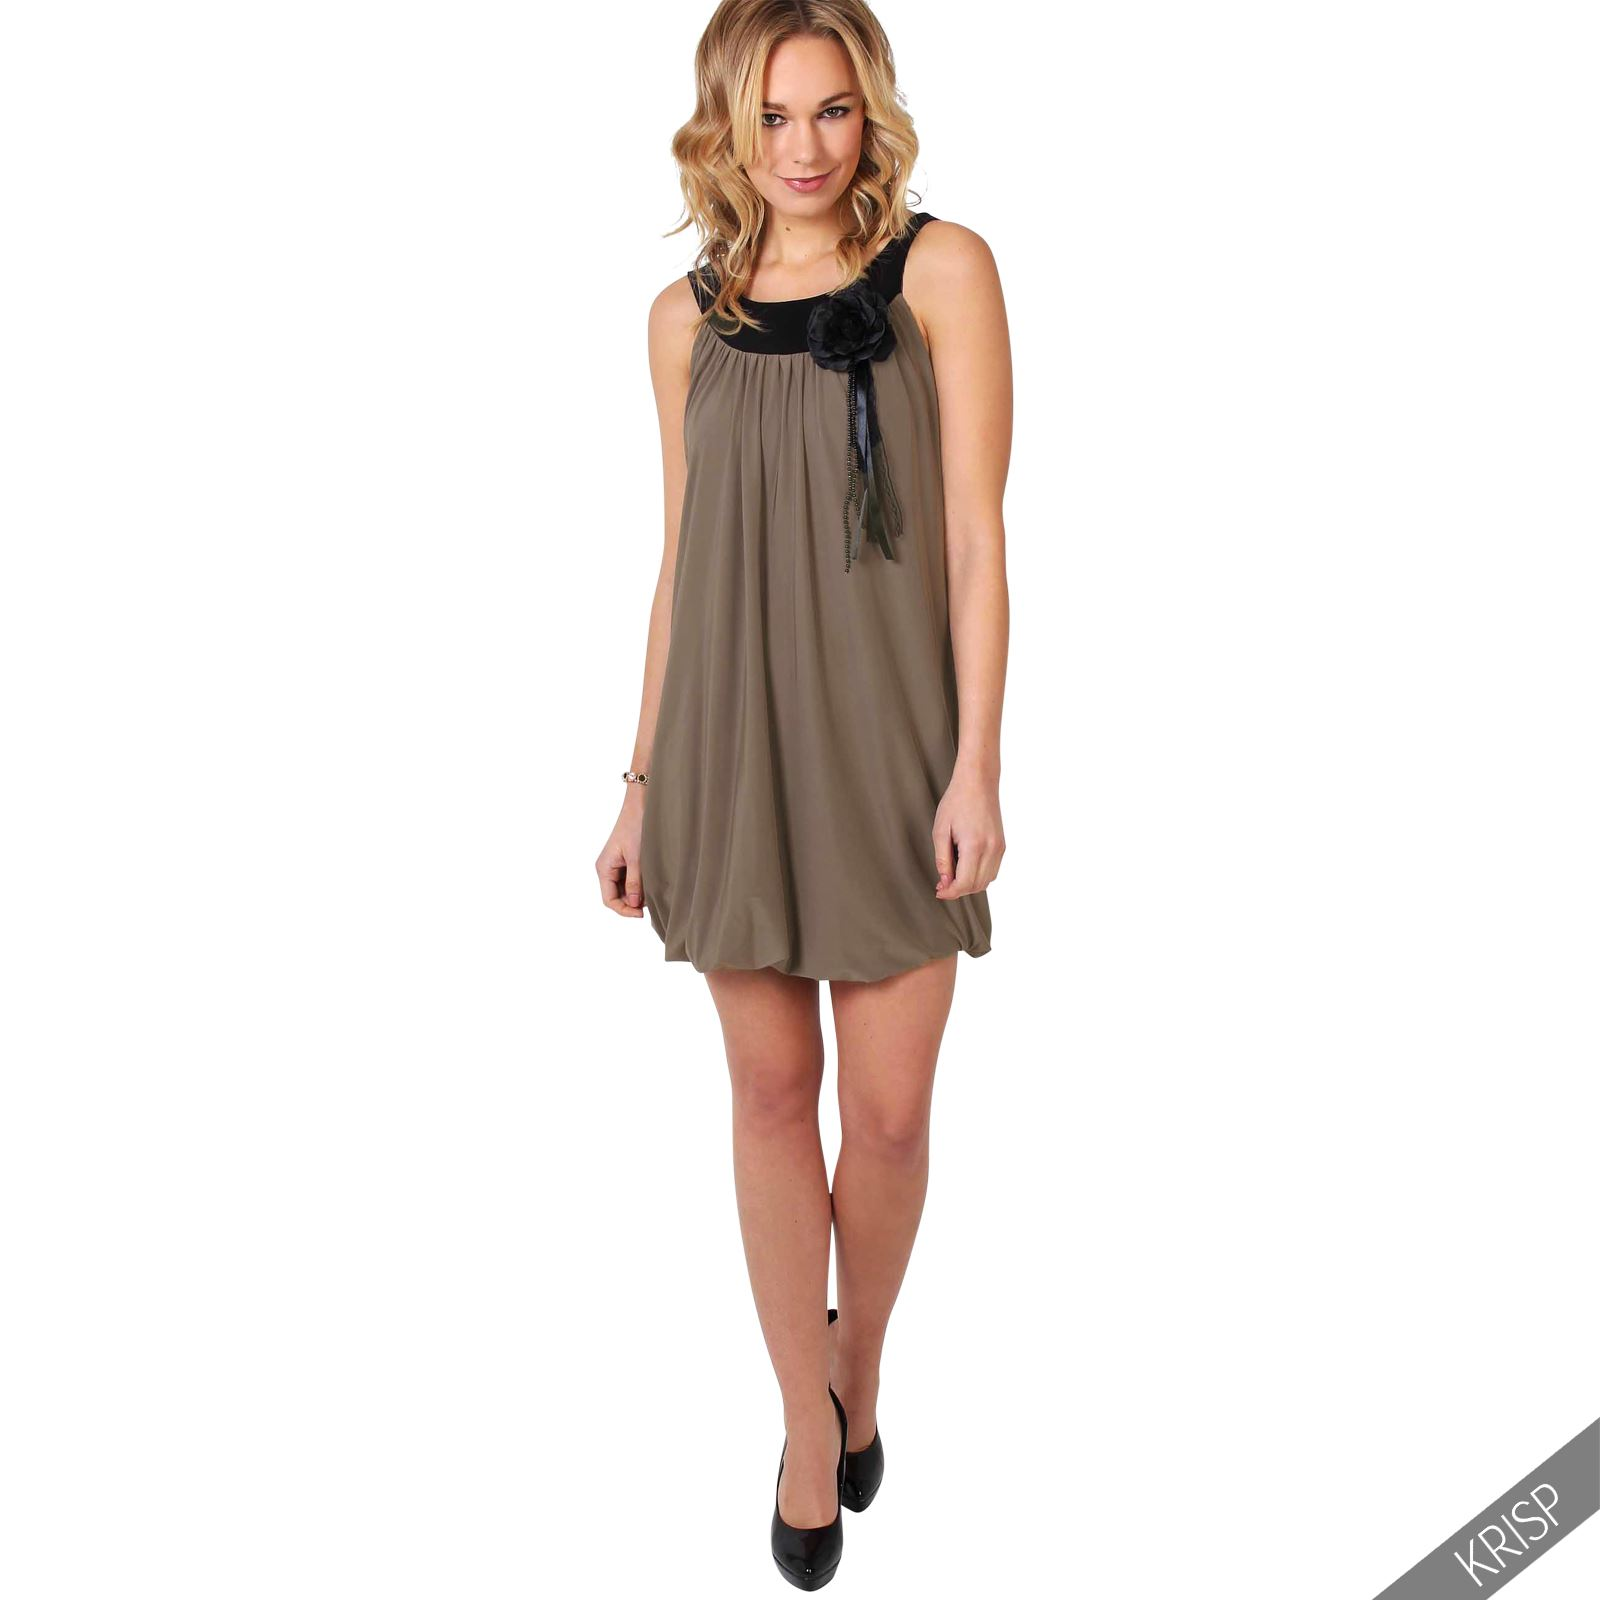 femmes robe mini courte tunique r tro vintage broche fleurs pliss e ann es 20 39 ebay. Black Bedroom Furniture Sets. Home Design Ideas